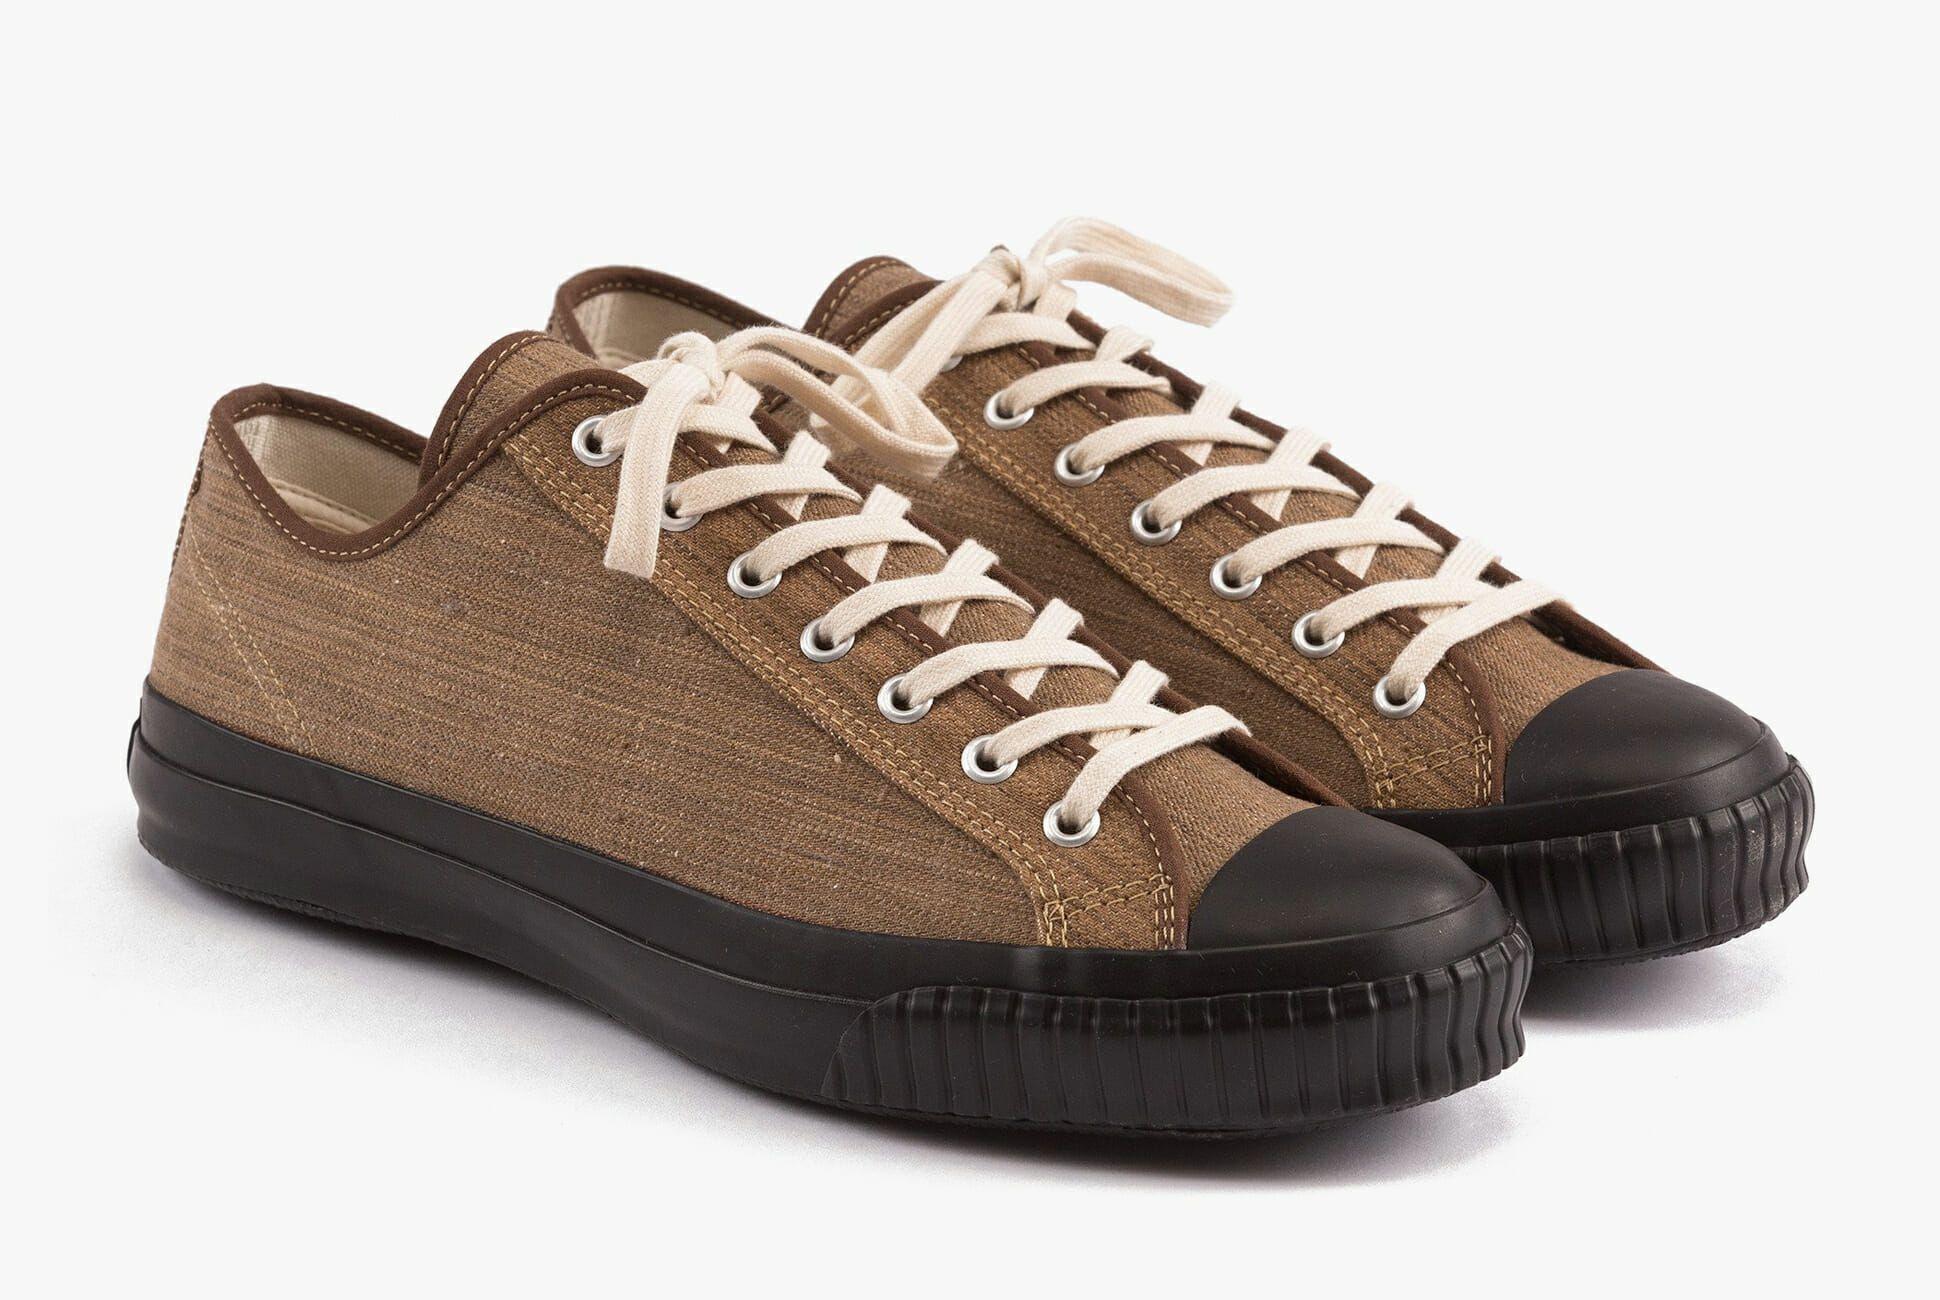 best canvas sneakers mens